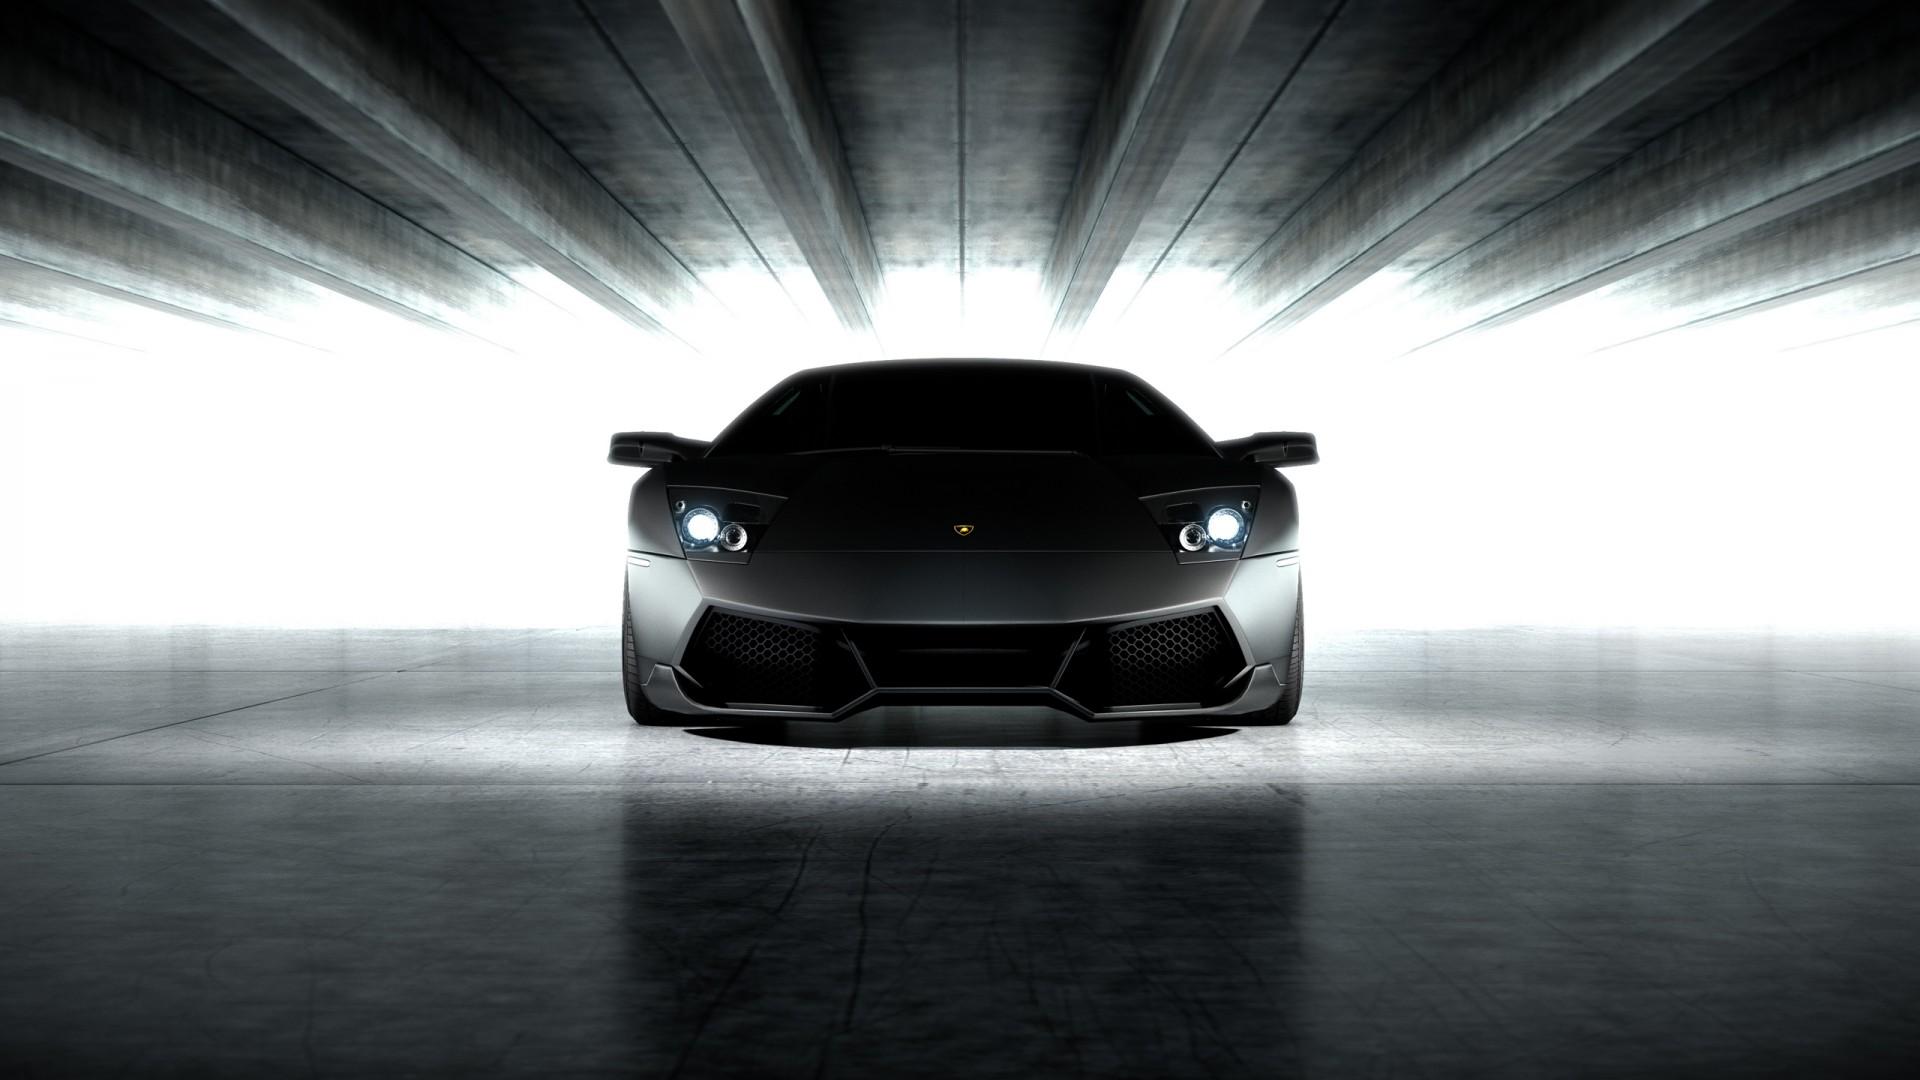 Cars Hd Wallpapers 1080p For Pc Bmw Lamborghini Murcielago 2 Wallpaper Hd Car Wallpapers